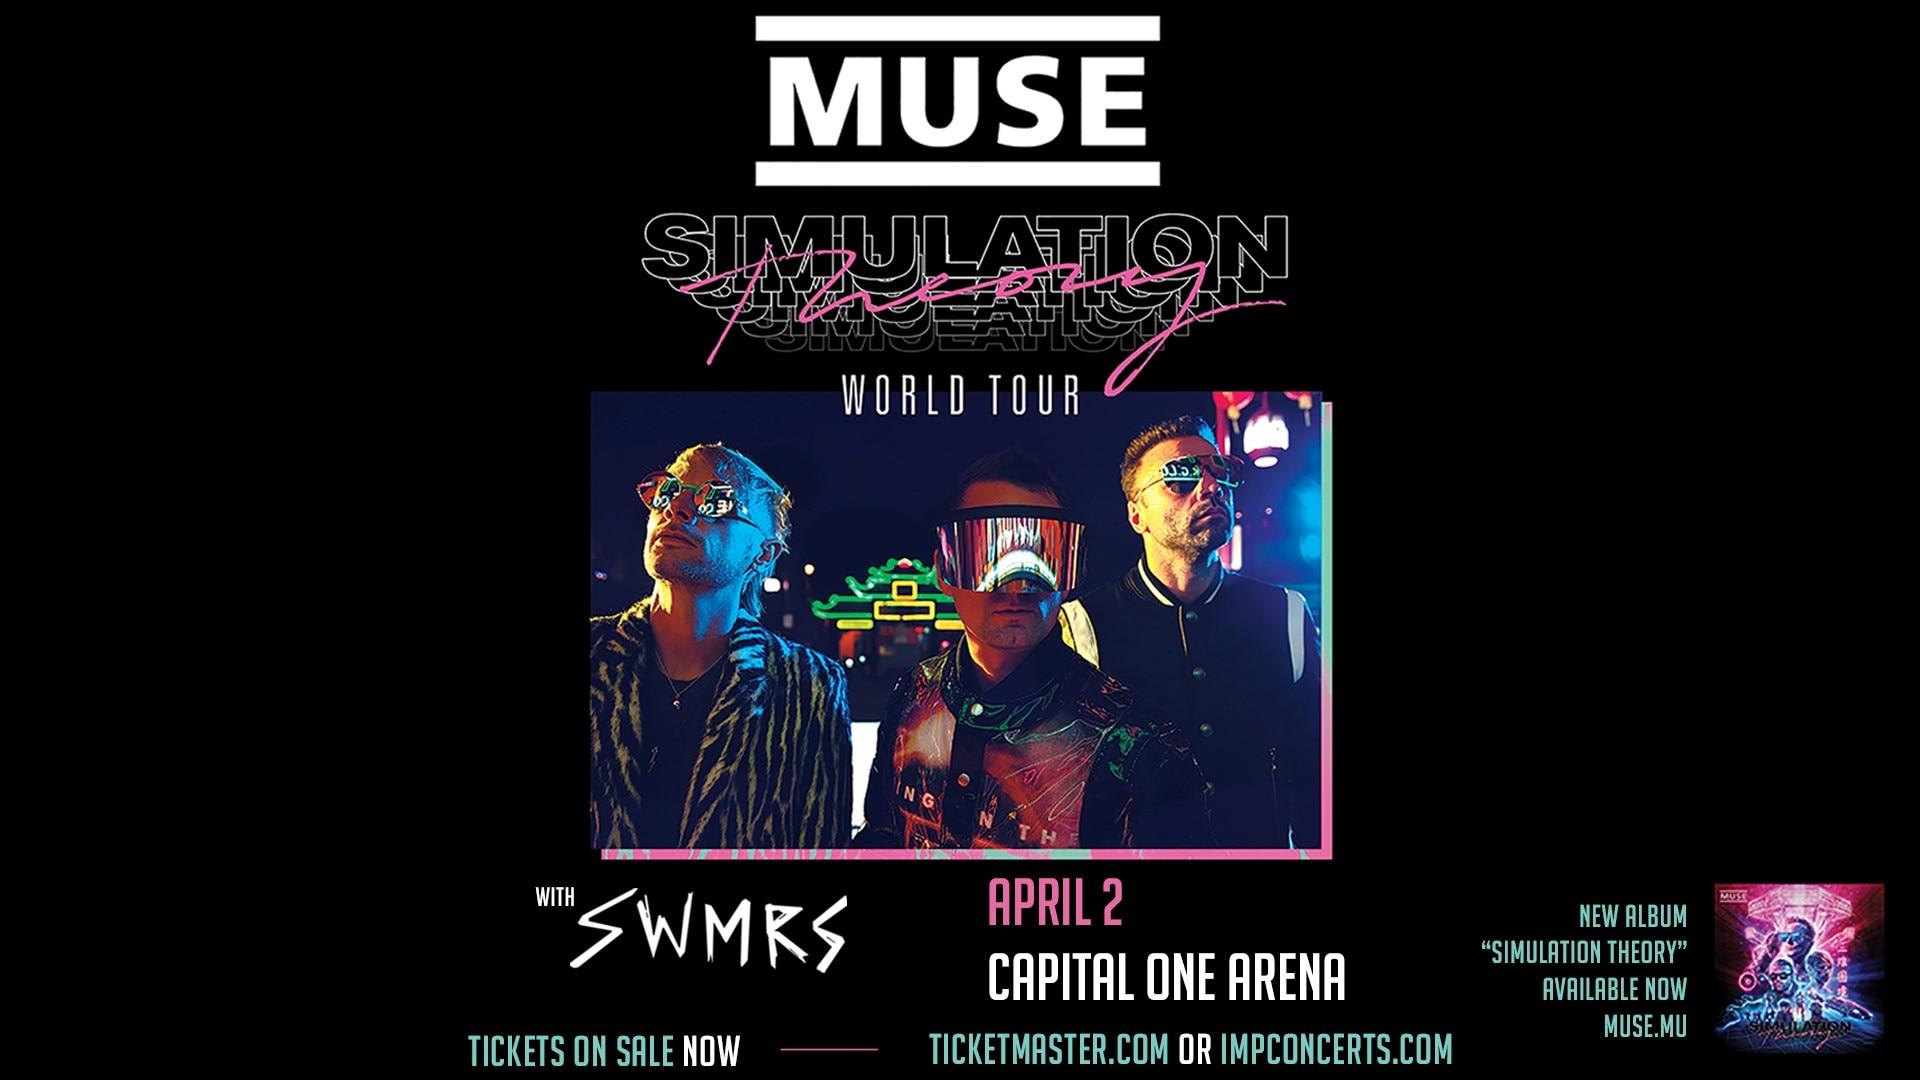 MUSE - Simulation Theory World Tour  w/ SWMRS